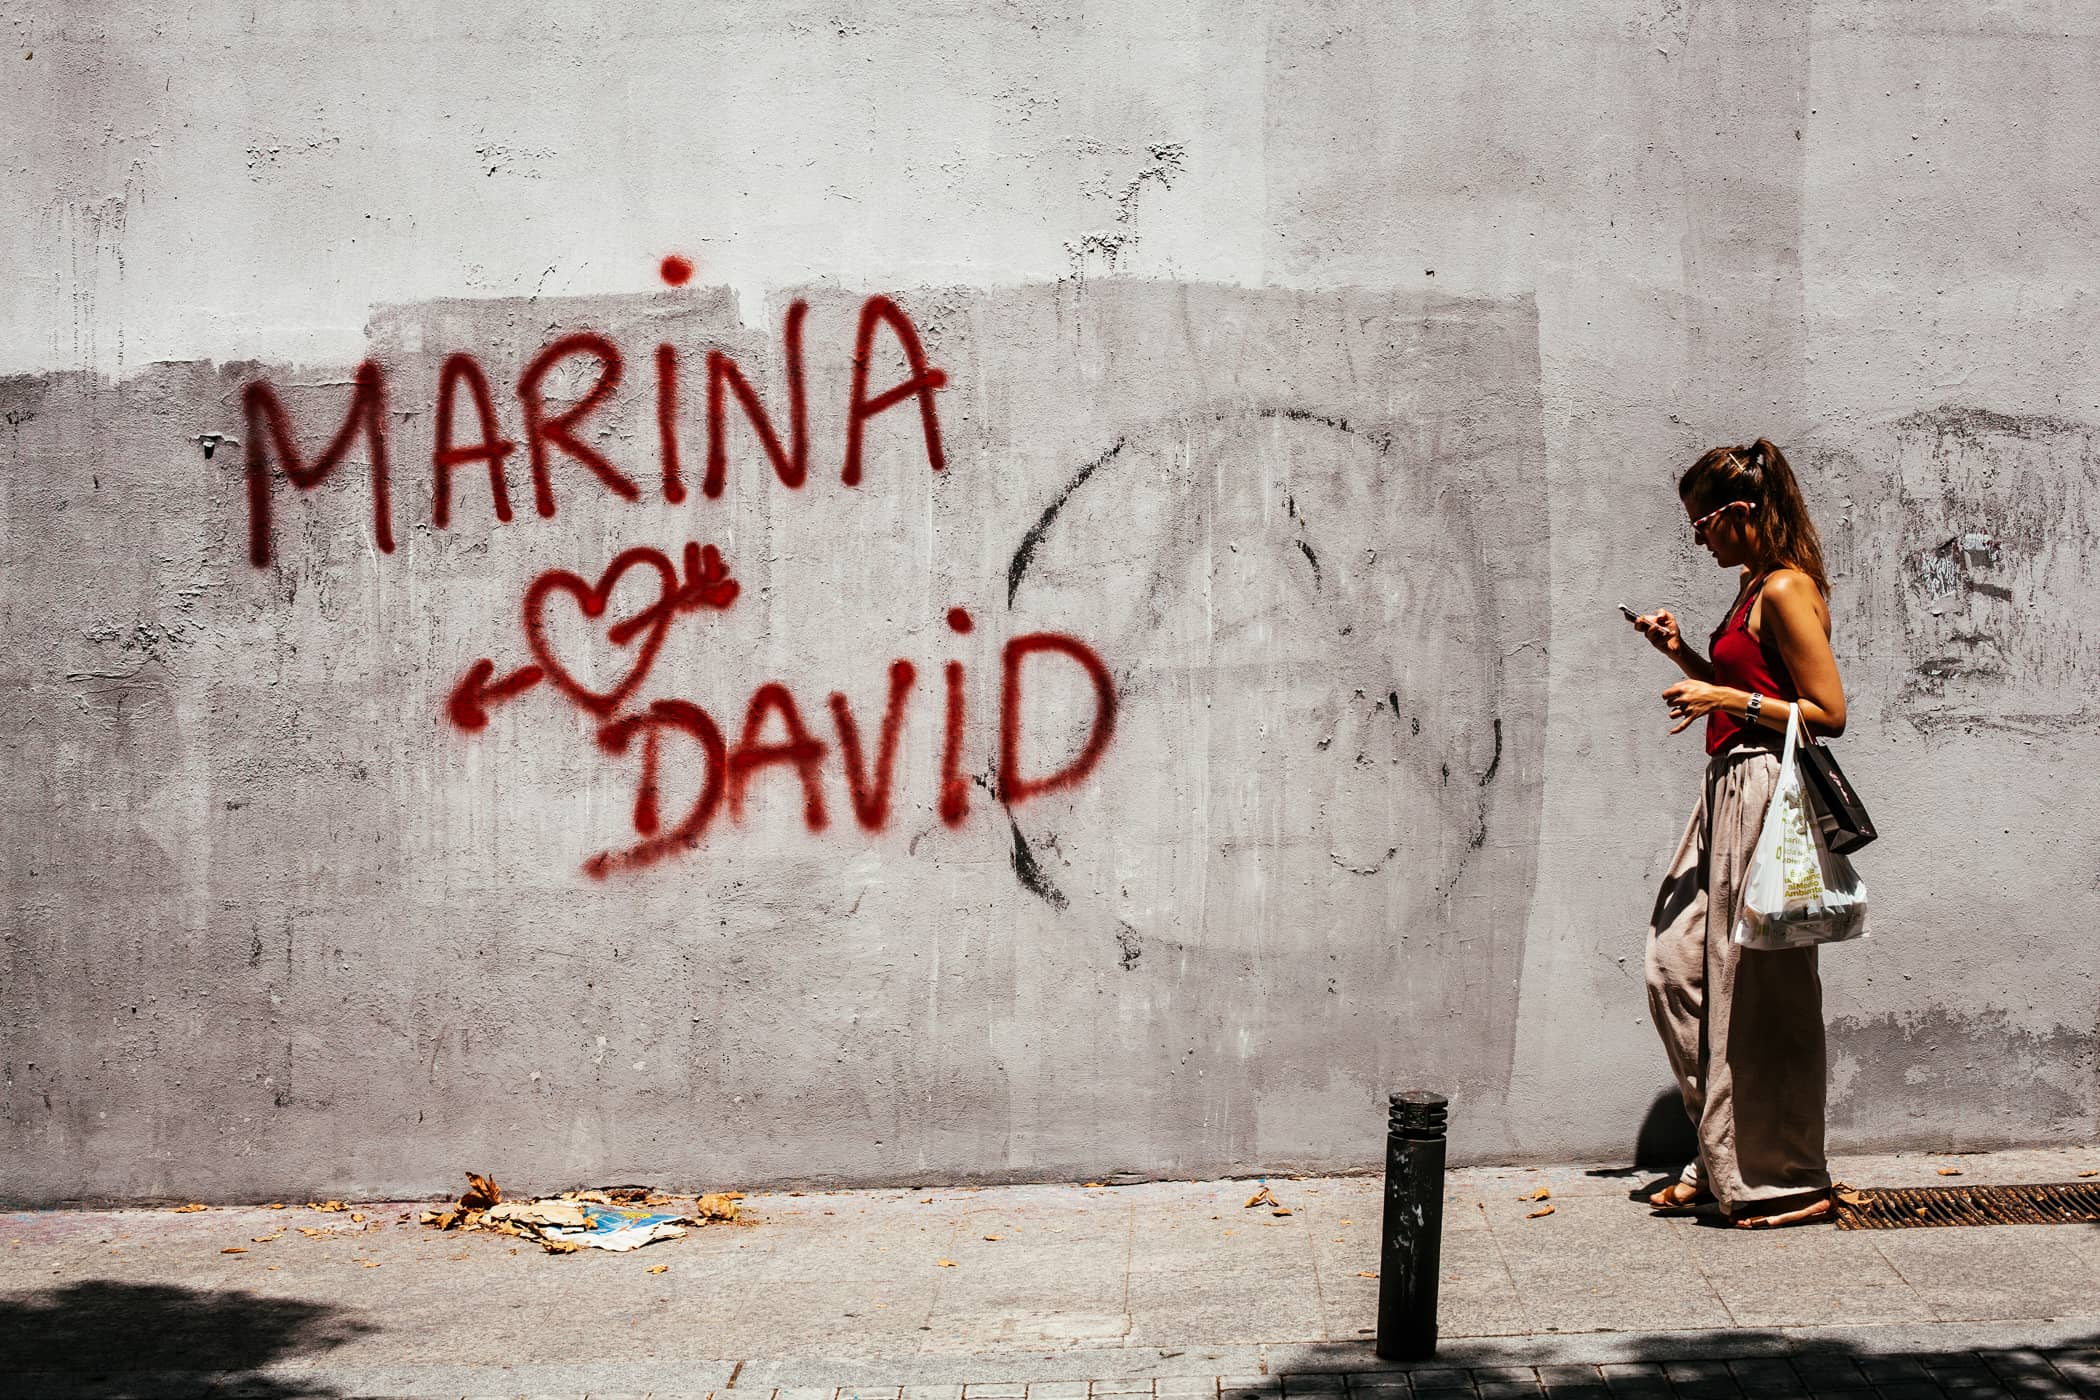 El ojo izquierdo - Marina and david